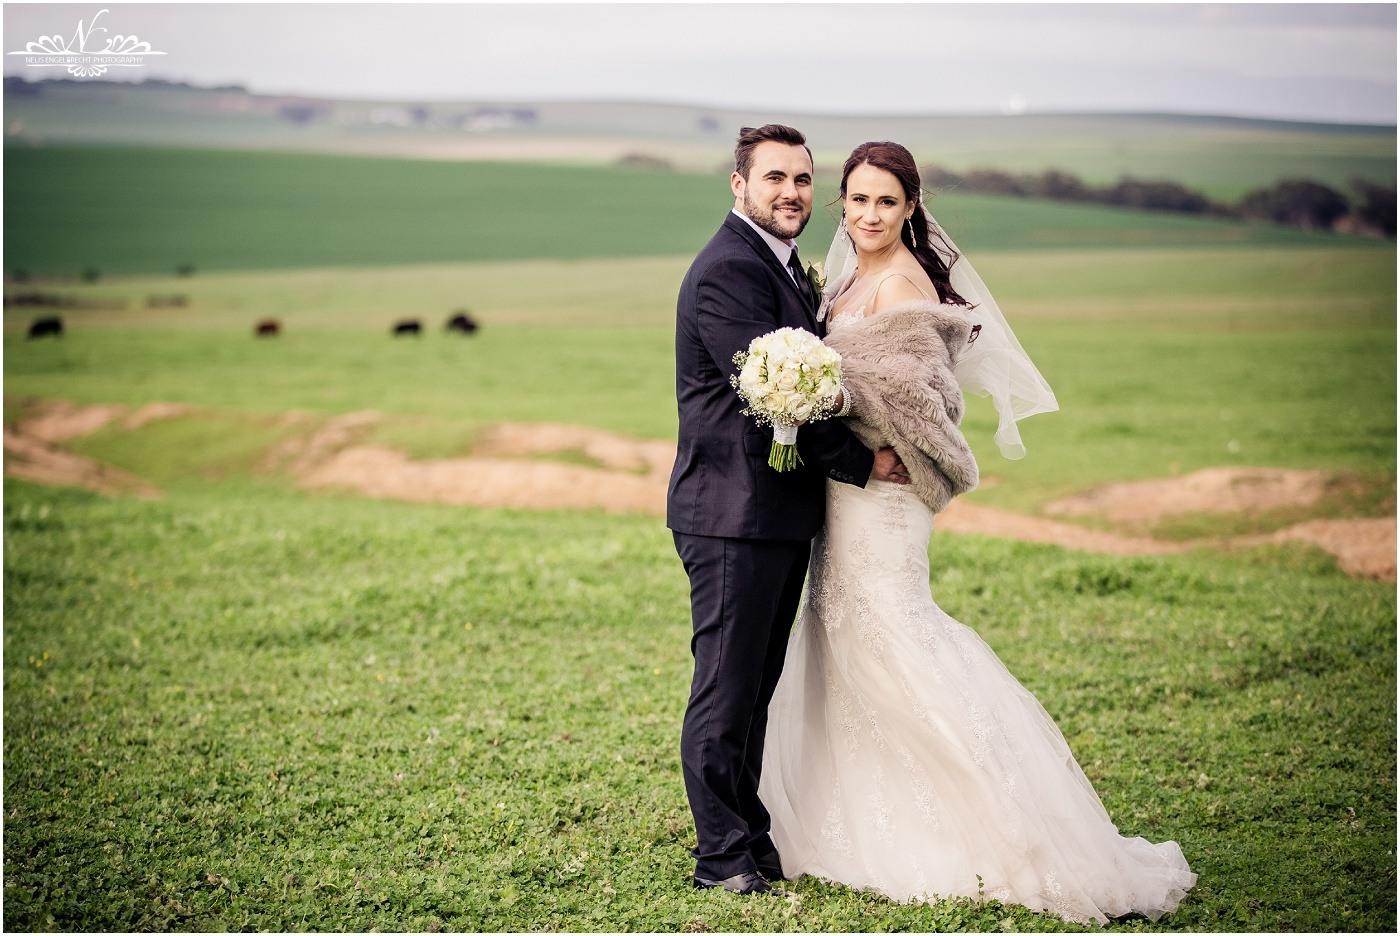 Eensgezind-Wedding-Photos-Nelis-Engelbrecht-Photography-089